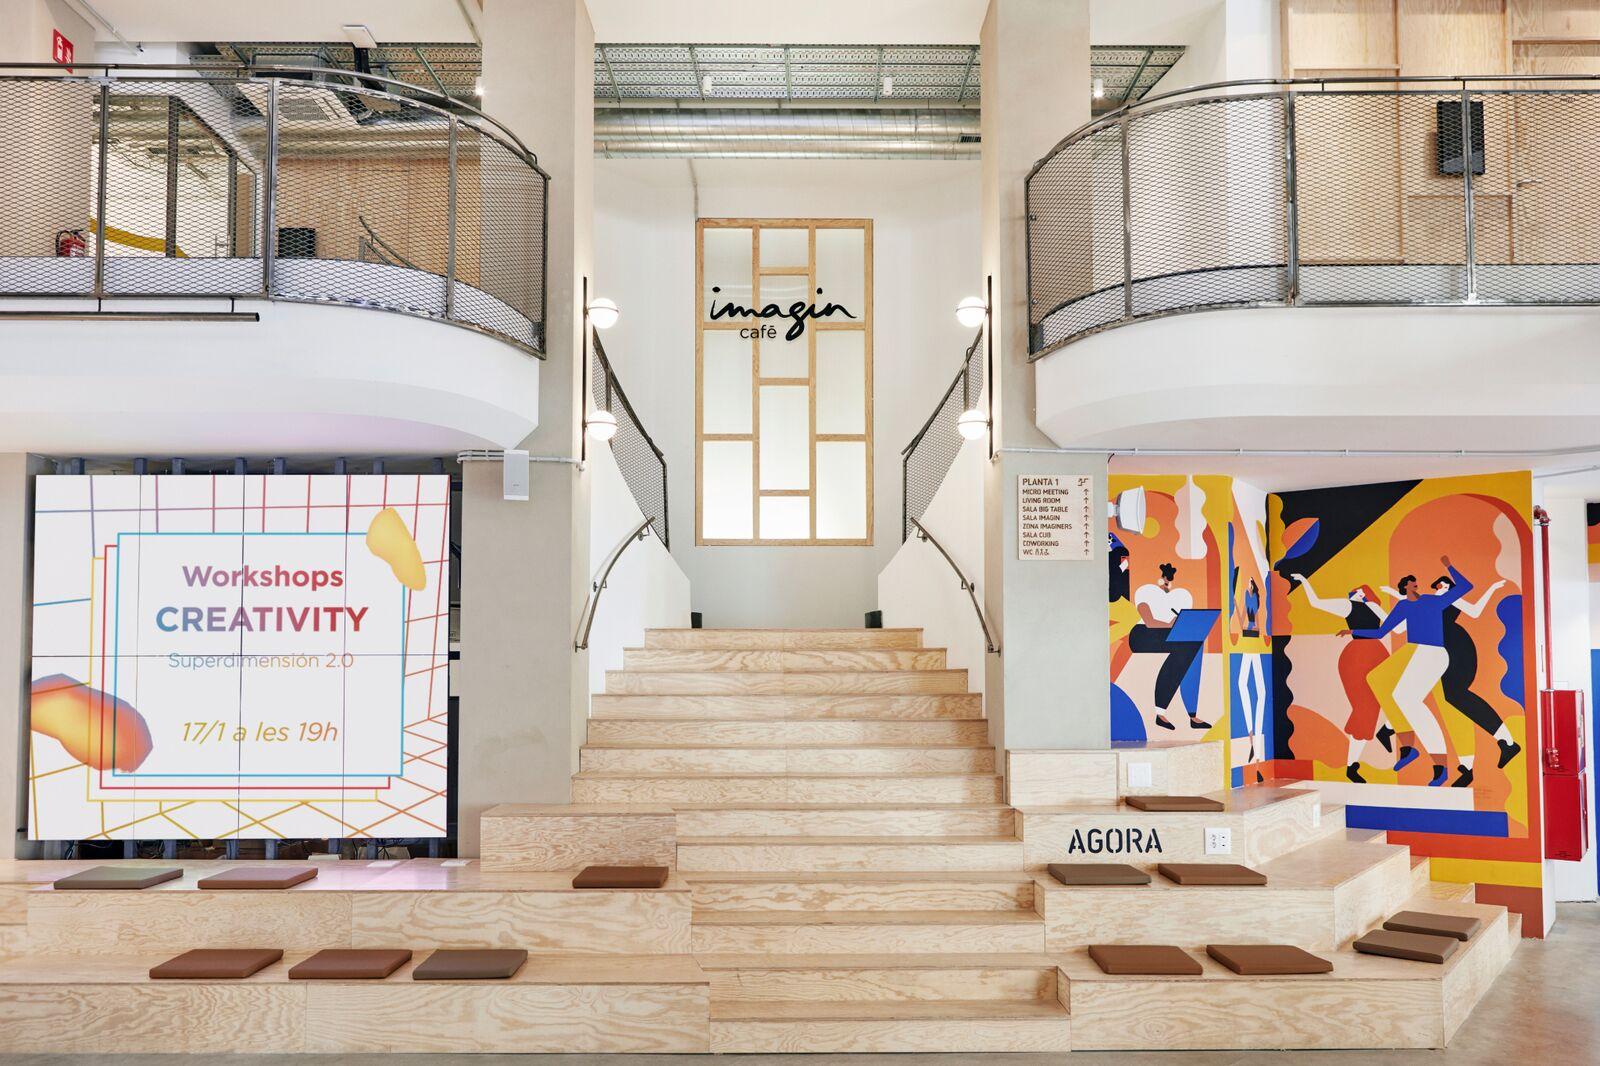 Un centro cultural para millenials & generación Z · imaginCafé